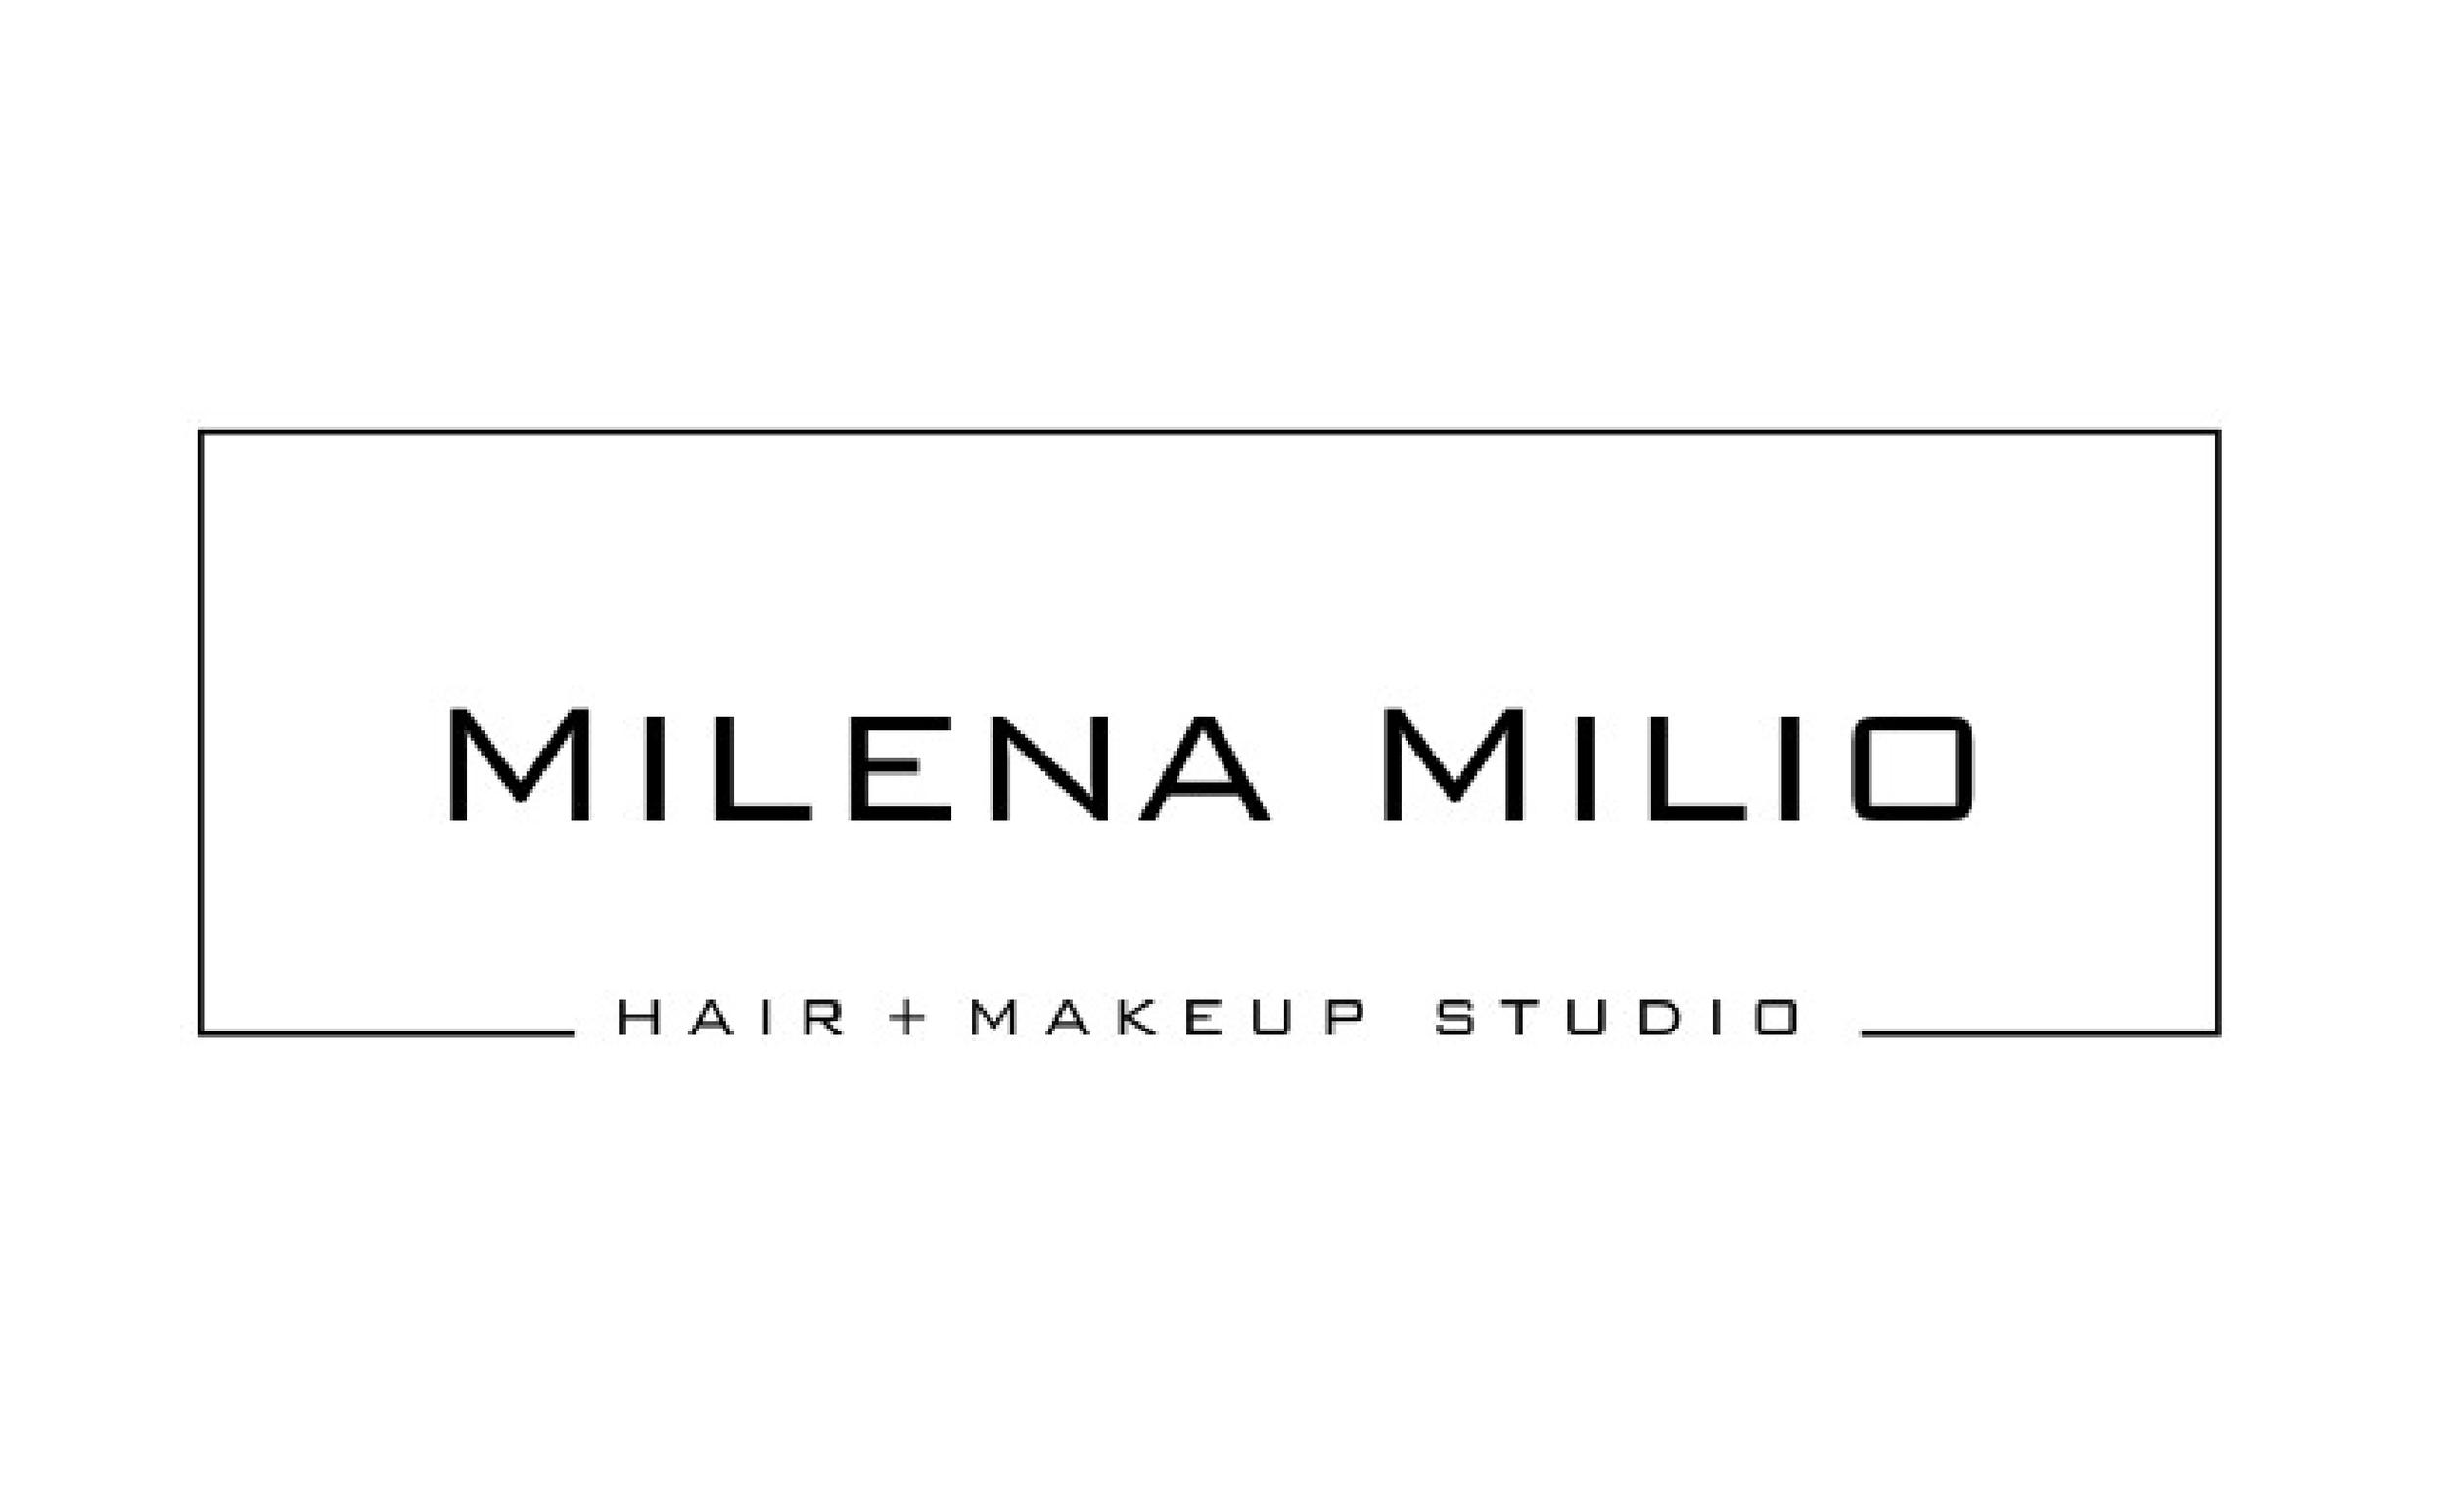 Milena Milio Hair + Makeup Studio